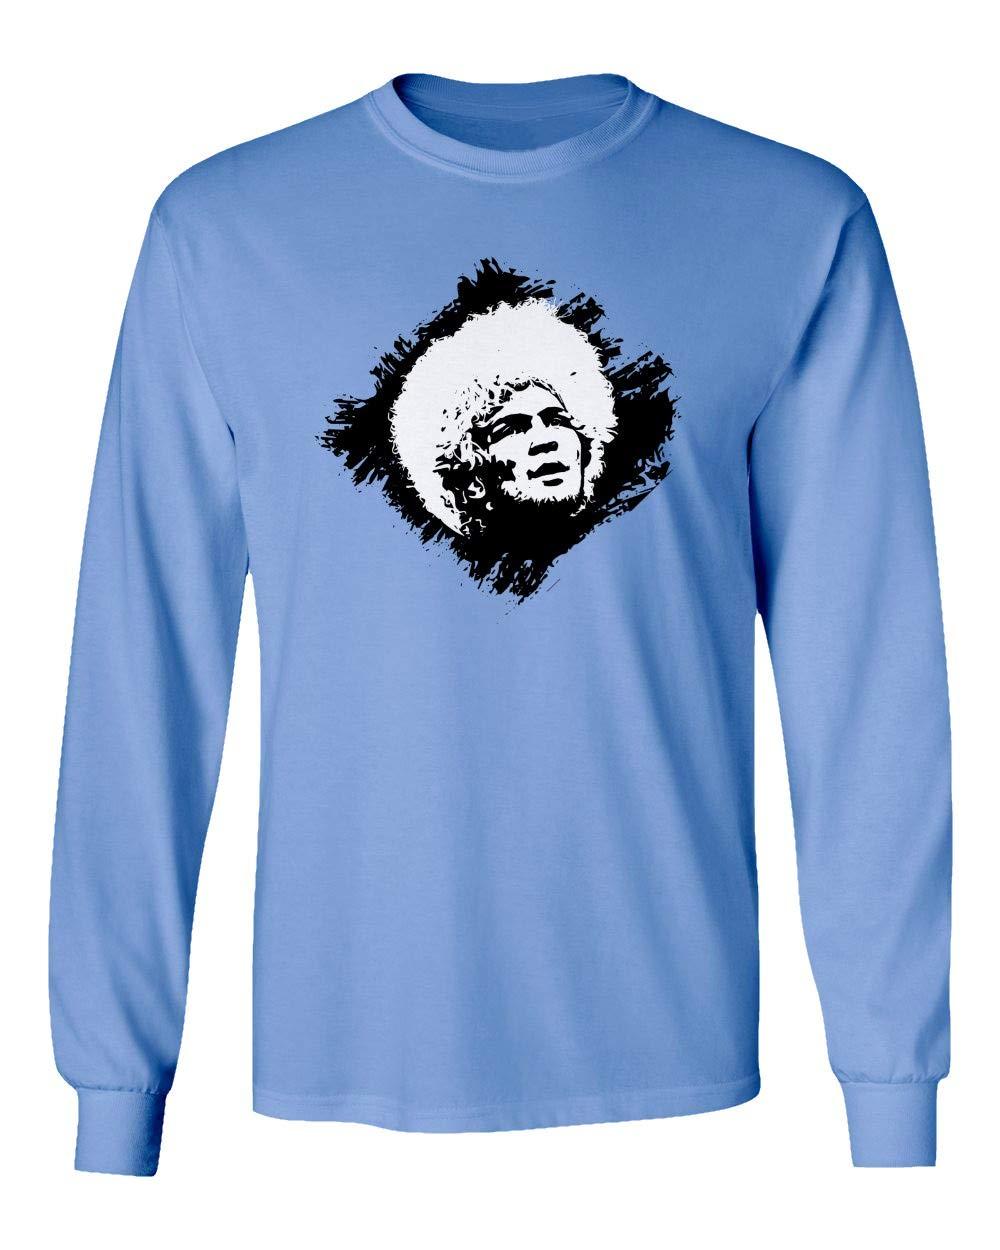 354d181d4 Amazon.com: SMARTZONE The Eagle Khabib Time Ufc Fight Men's Long Sleeve T- Shirt: Sports & Outdoors